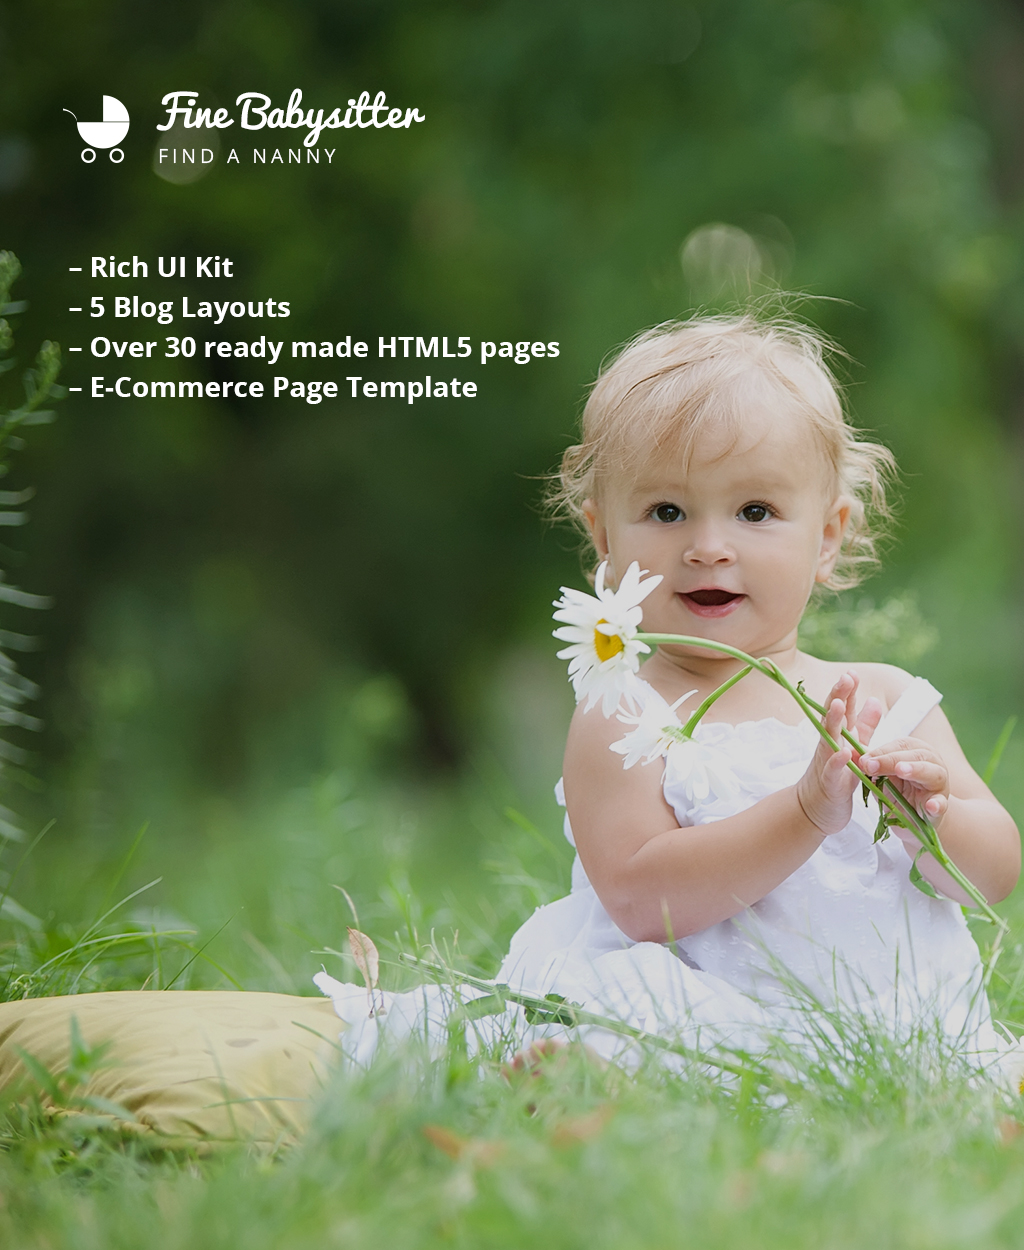 """Fine Babysitter - Nanny Services Responsive Multipage"" - адаптивний Шаблон сайту №62238"